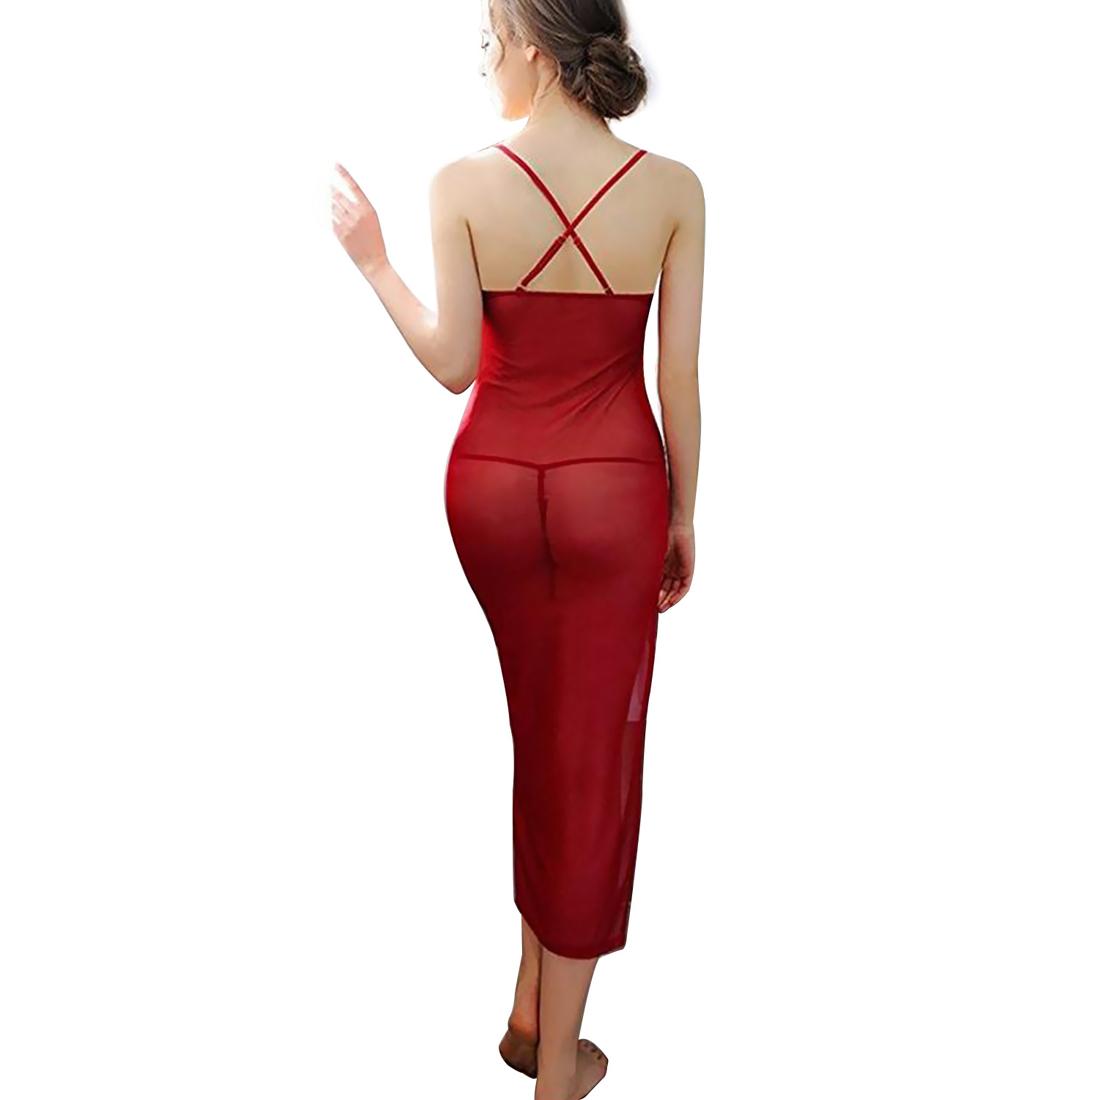 womens lingerie sheer mesh nightgown long maxi night dress. Black Bedroom Furniture Sets. Home Design Ideas